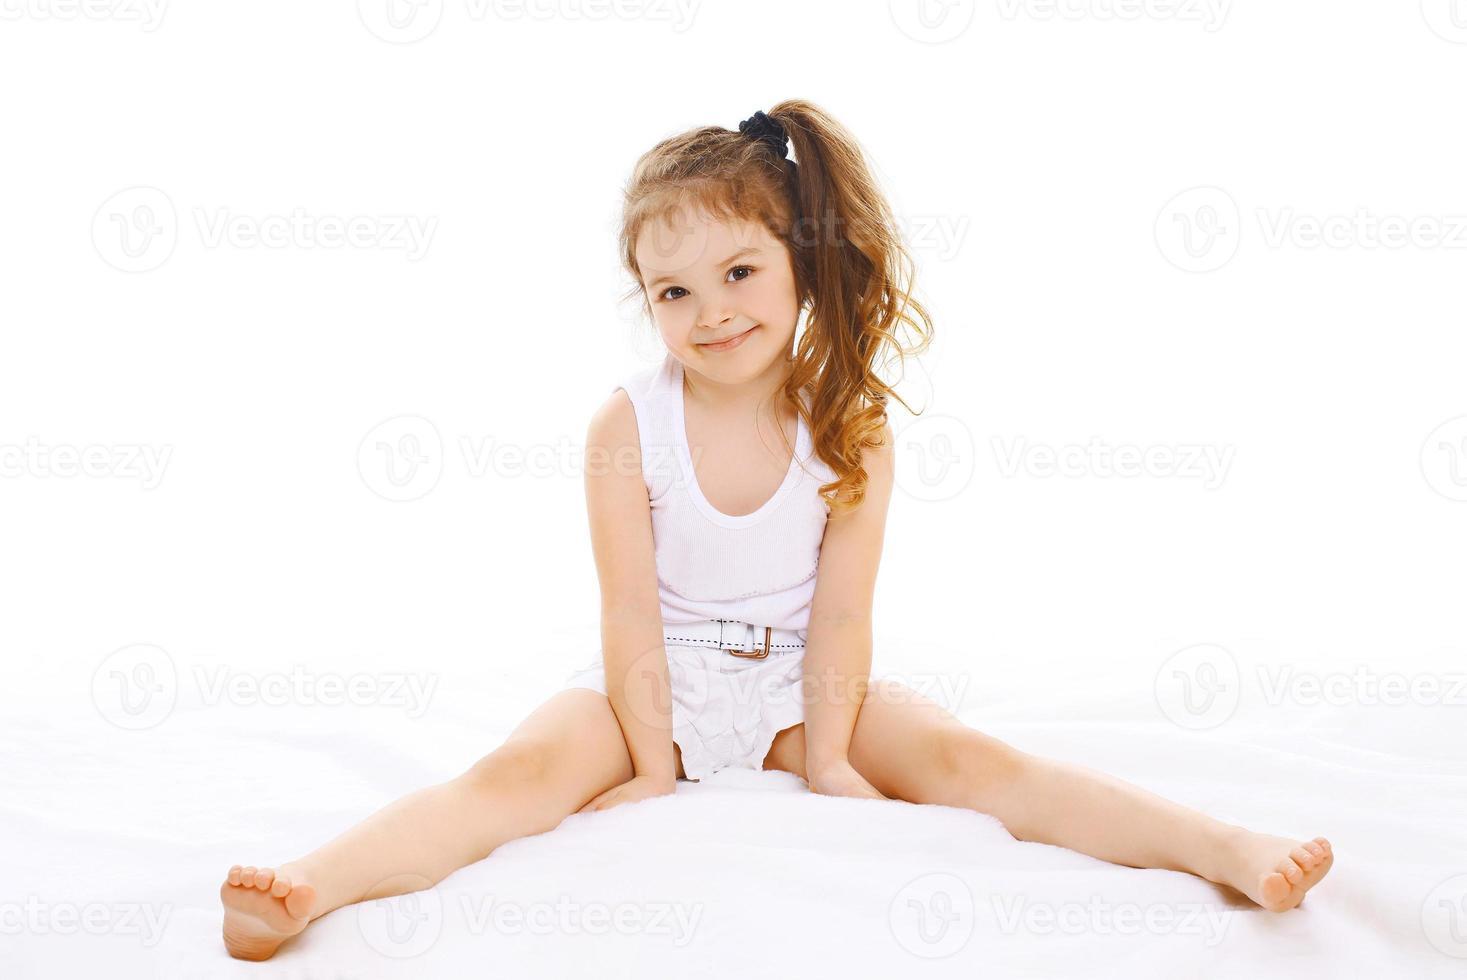 Portrait of happy little girl child having fun photo